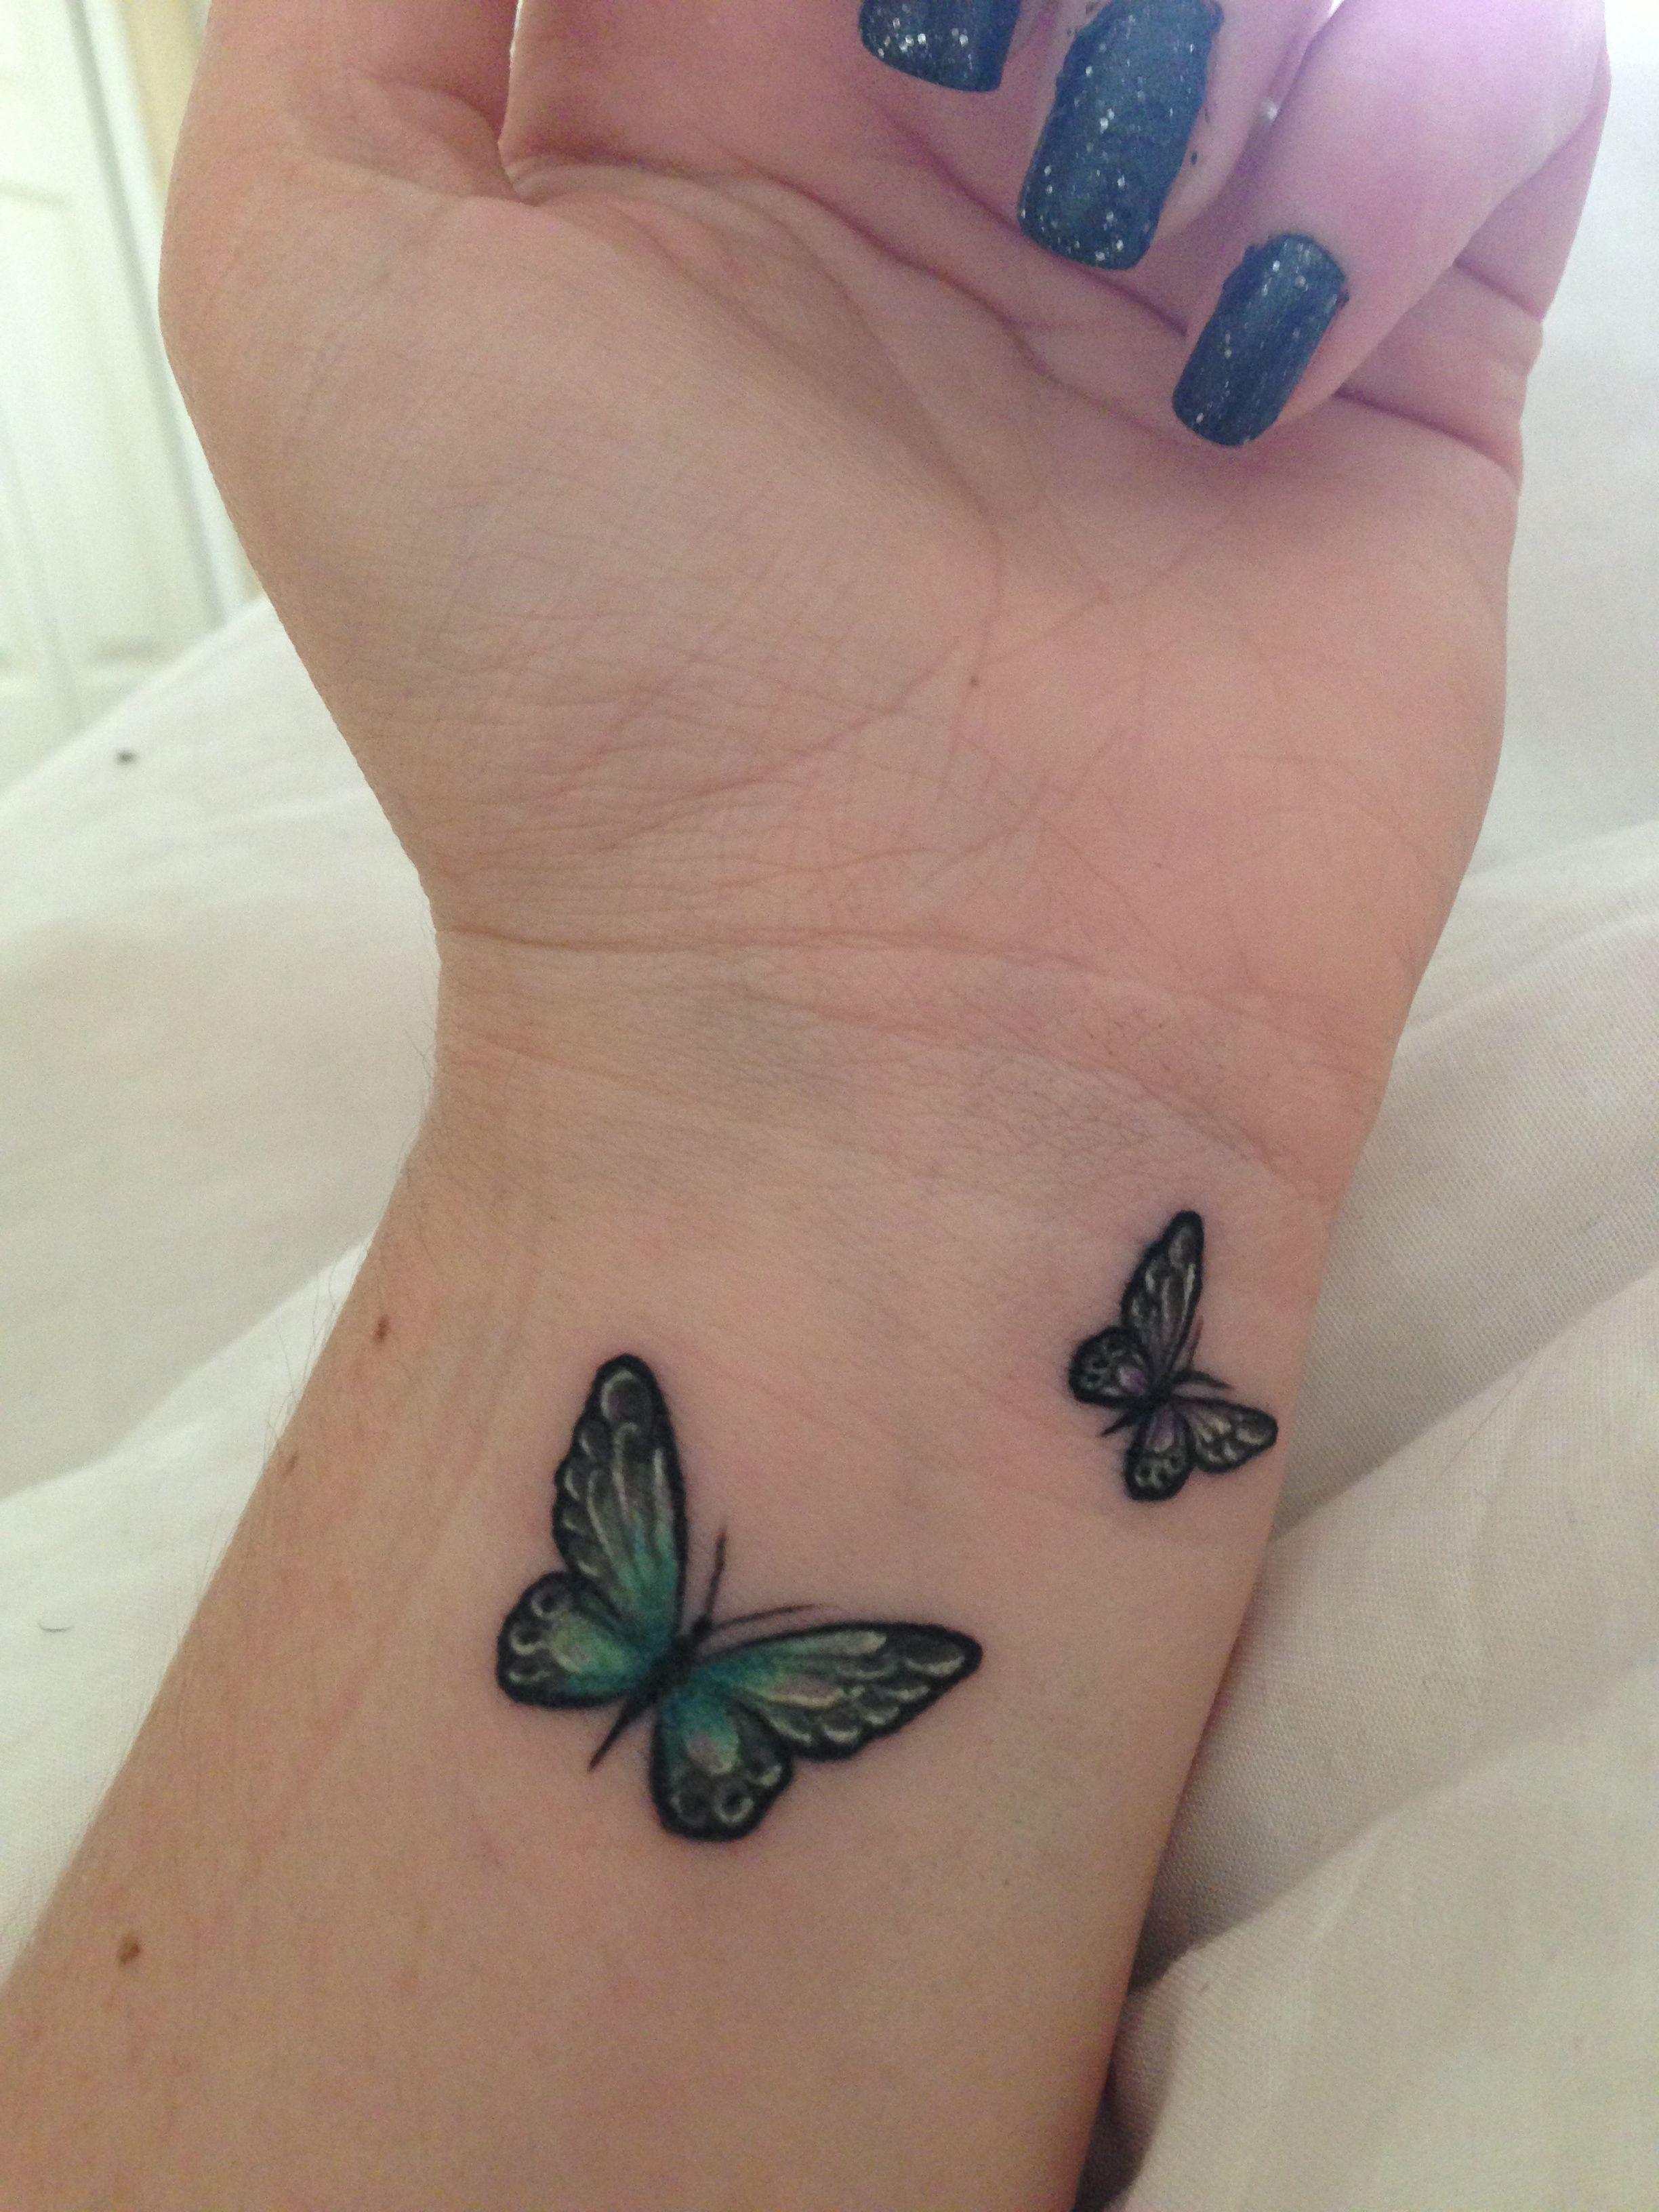 Pin on Pancreatic cancer tattoo